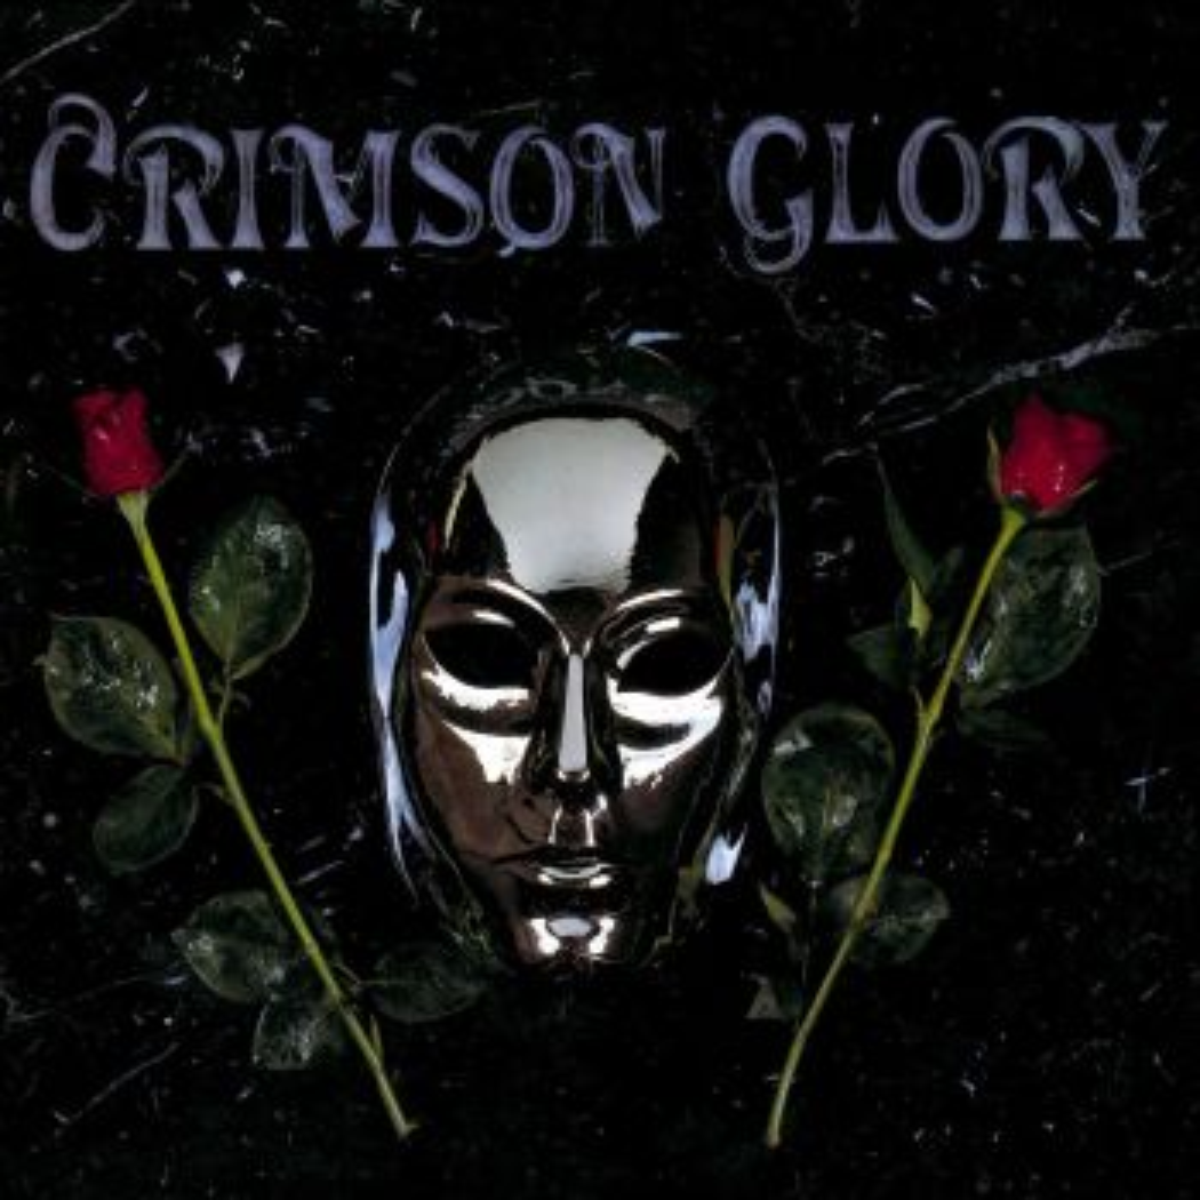 Crimson Glory — Crimson Glory (1986)